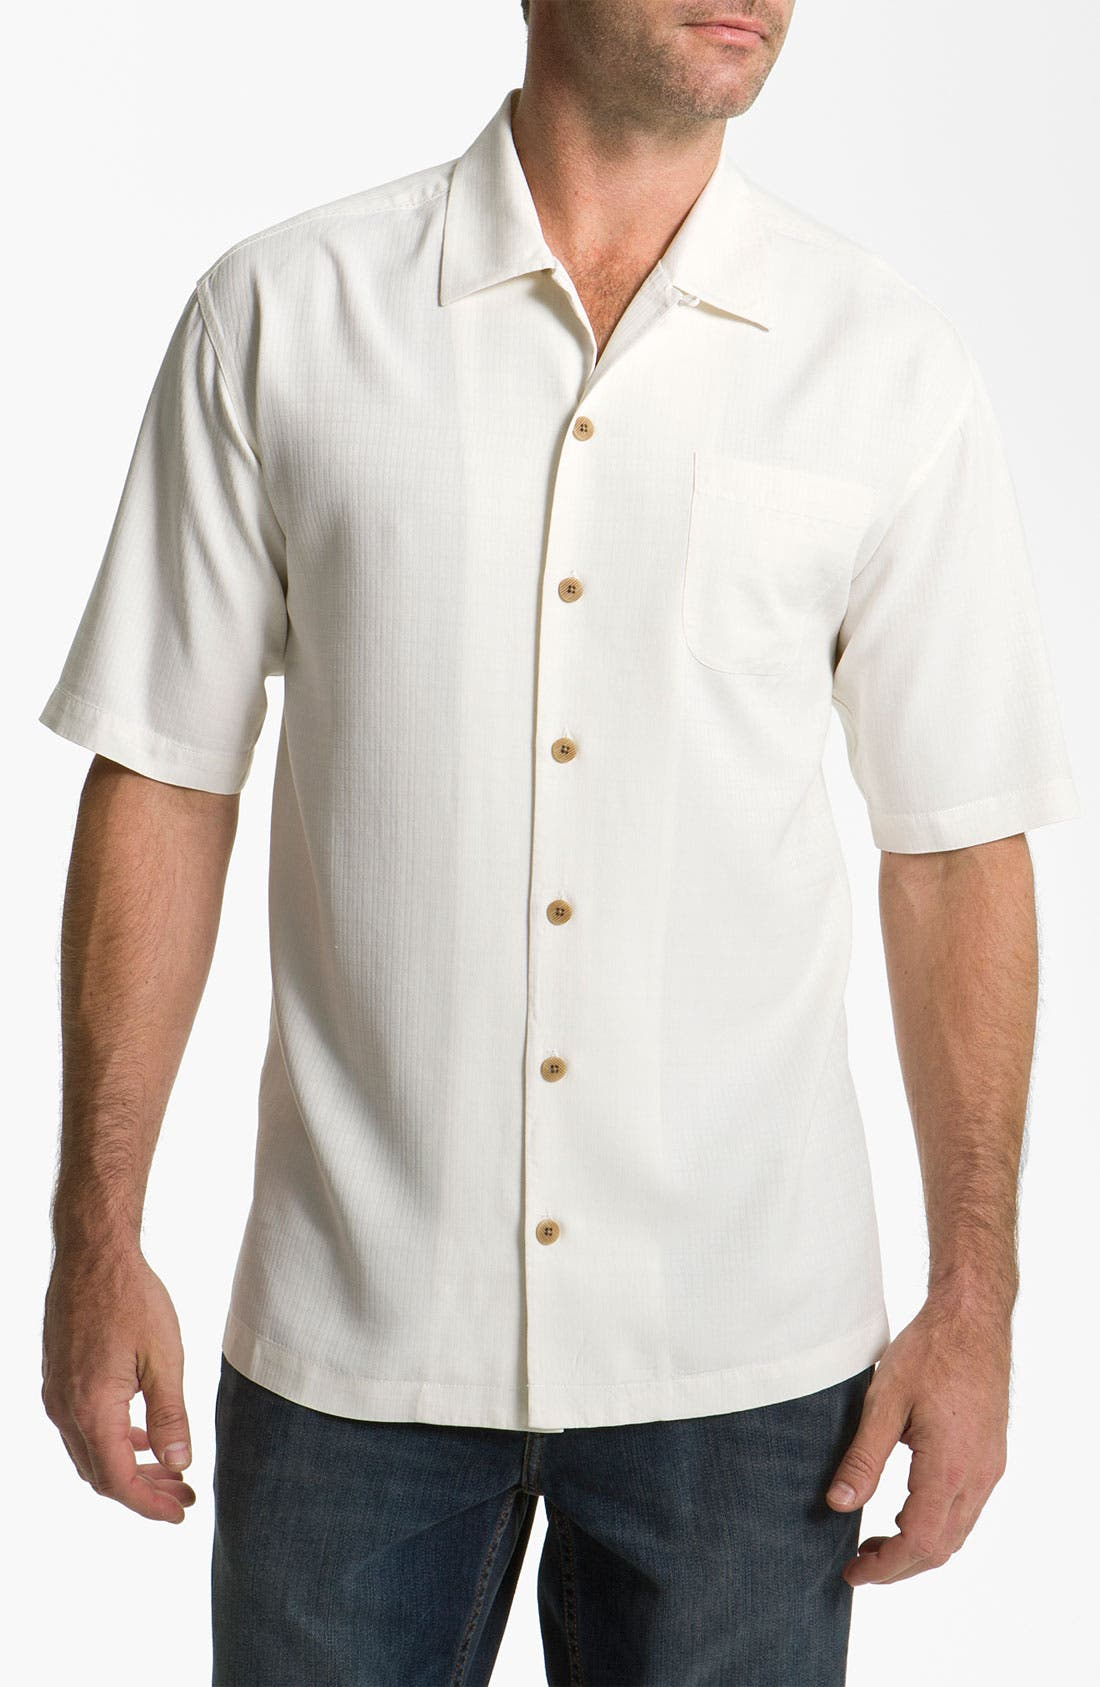 Alternate Image 1 Selected - Tommy Bahama 'Congo' Silk Campshirt